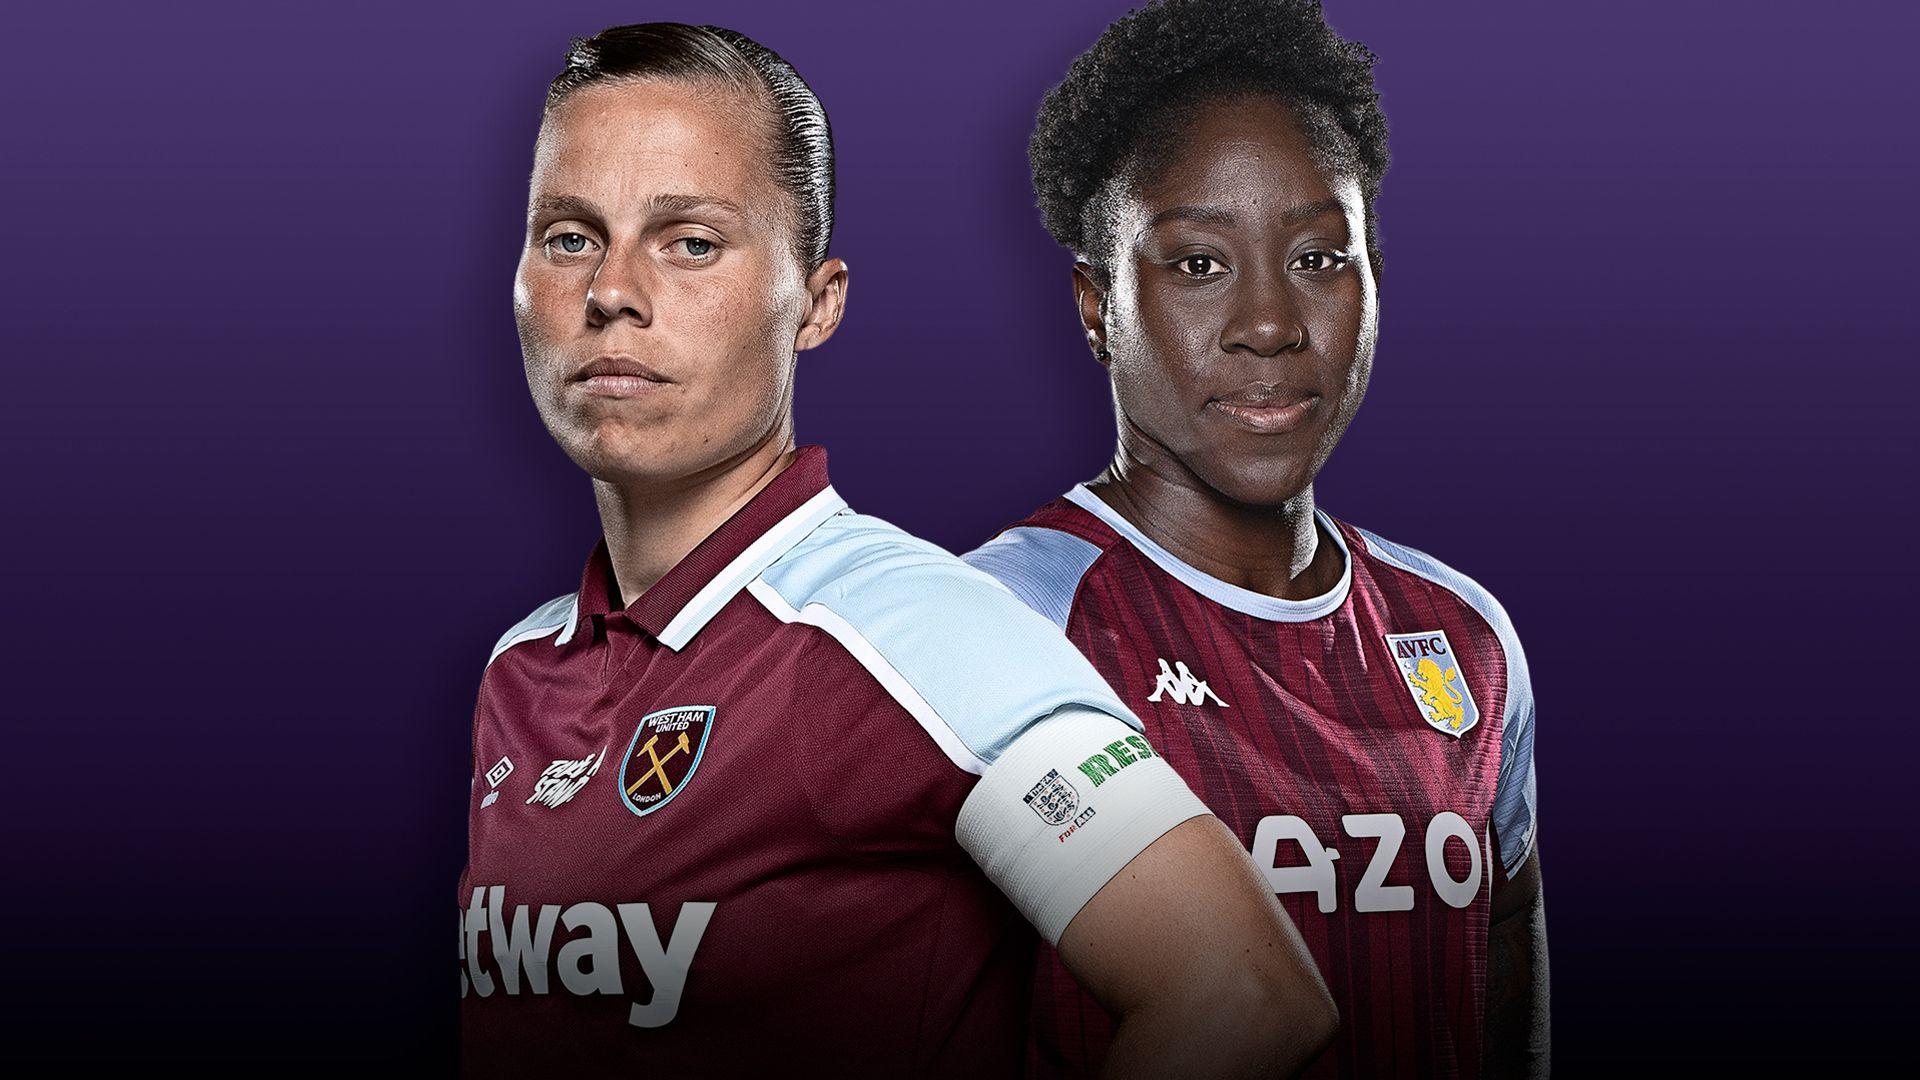 West Ham Women vs Aston Villa Women: Women's Super League preview, team news, TV channel, stats, kick-off time